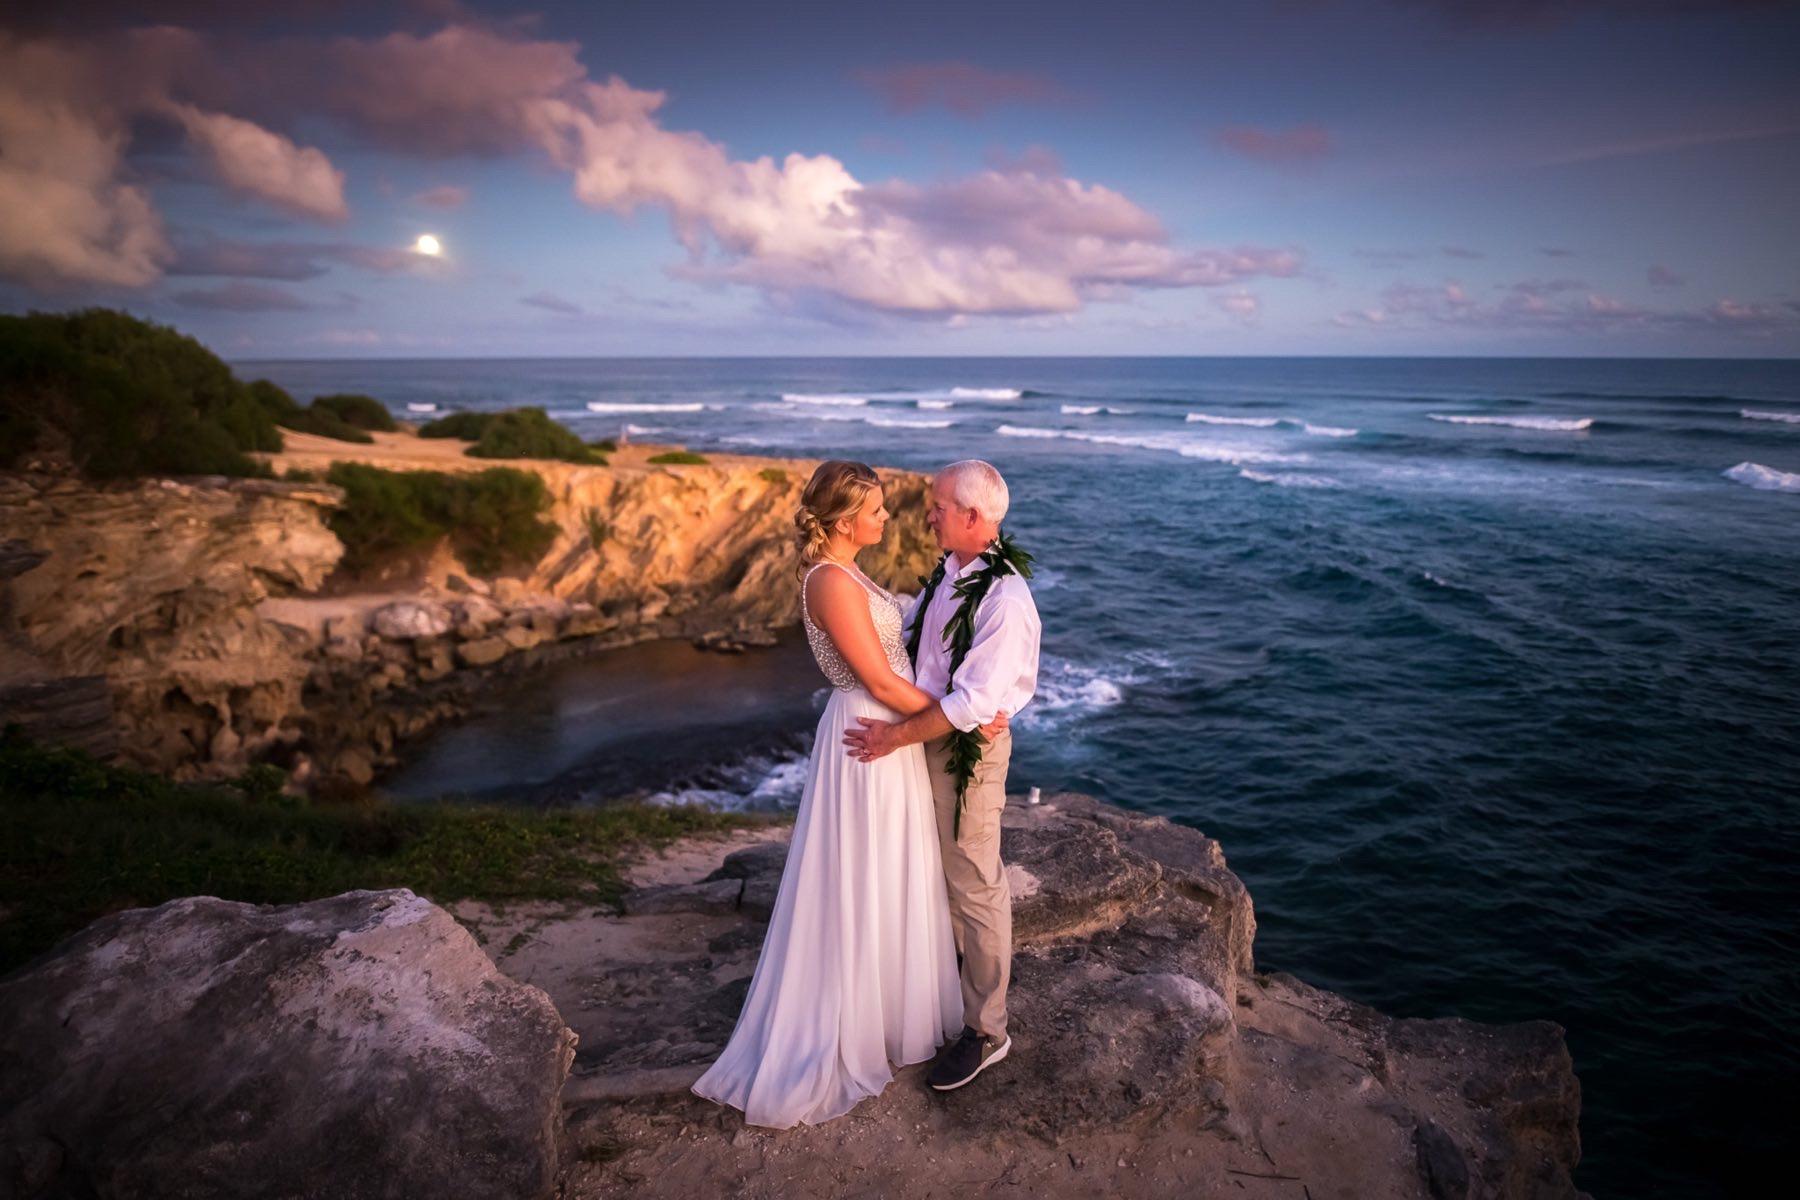 Todd & Angela on rocks overlooking the ocean.